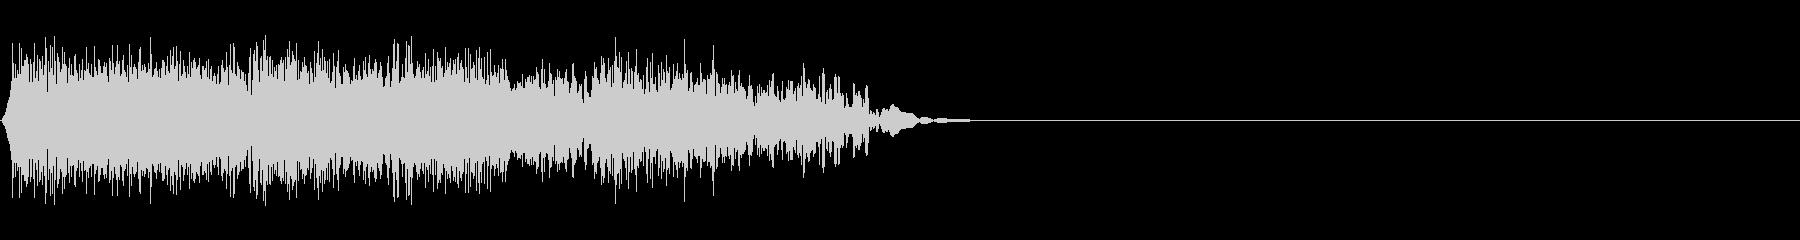 DJスクラッチ02_リバース音02の未再生の波形